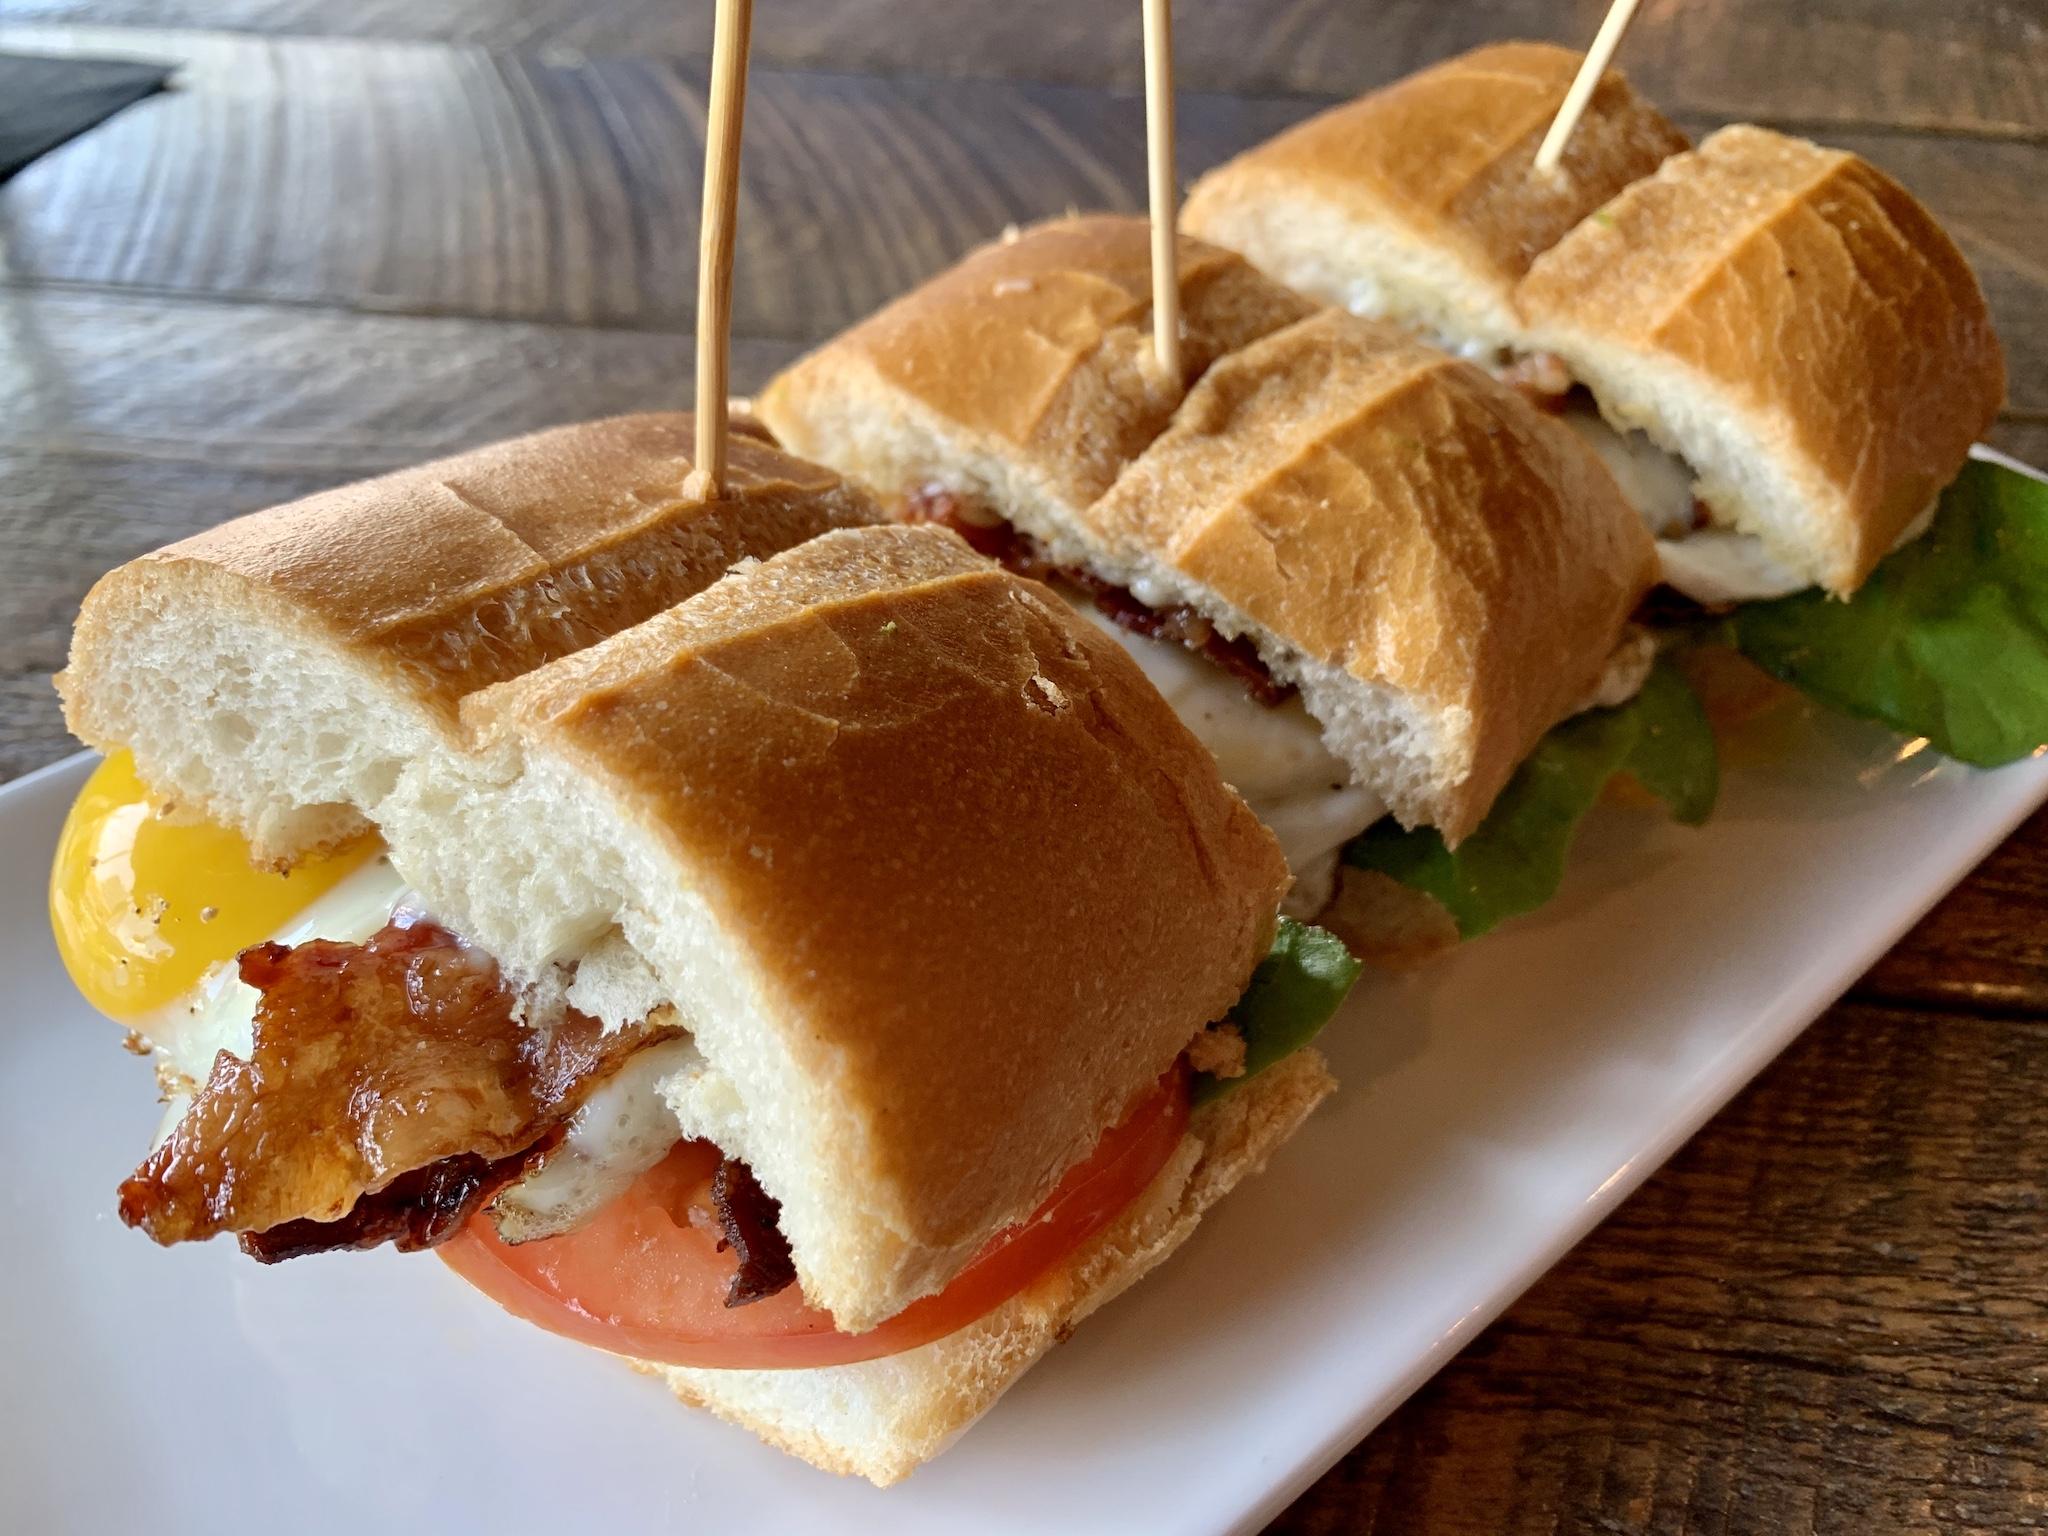 BLT Sliders - Cuban bread, gem lettuce, candied bacon, tomato, egg, avocado and basil garlic aioli